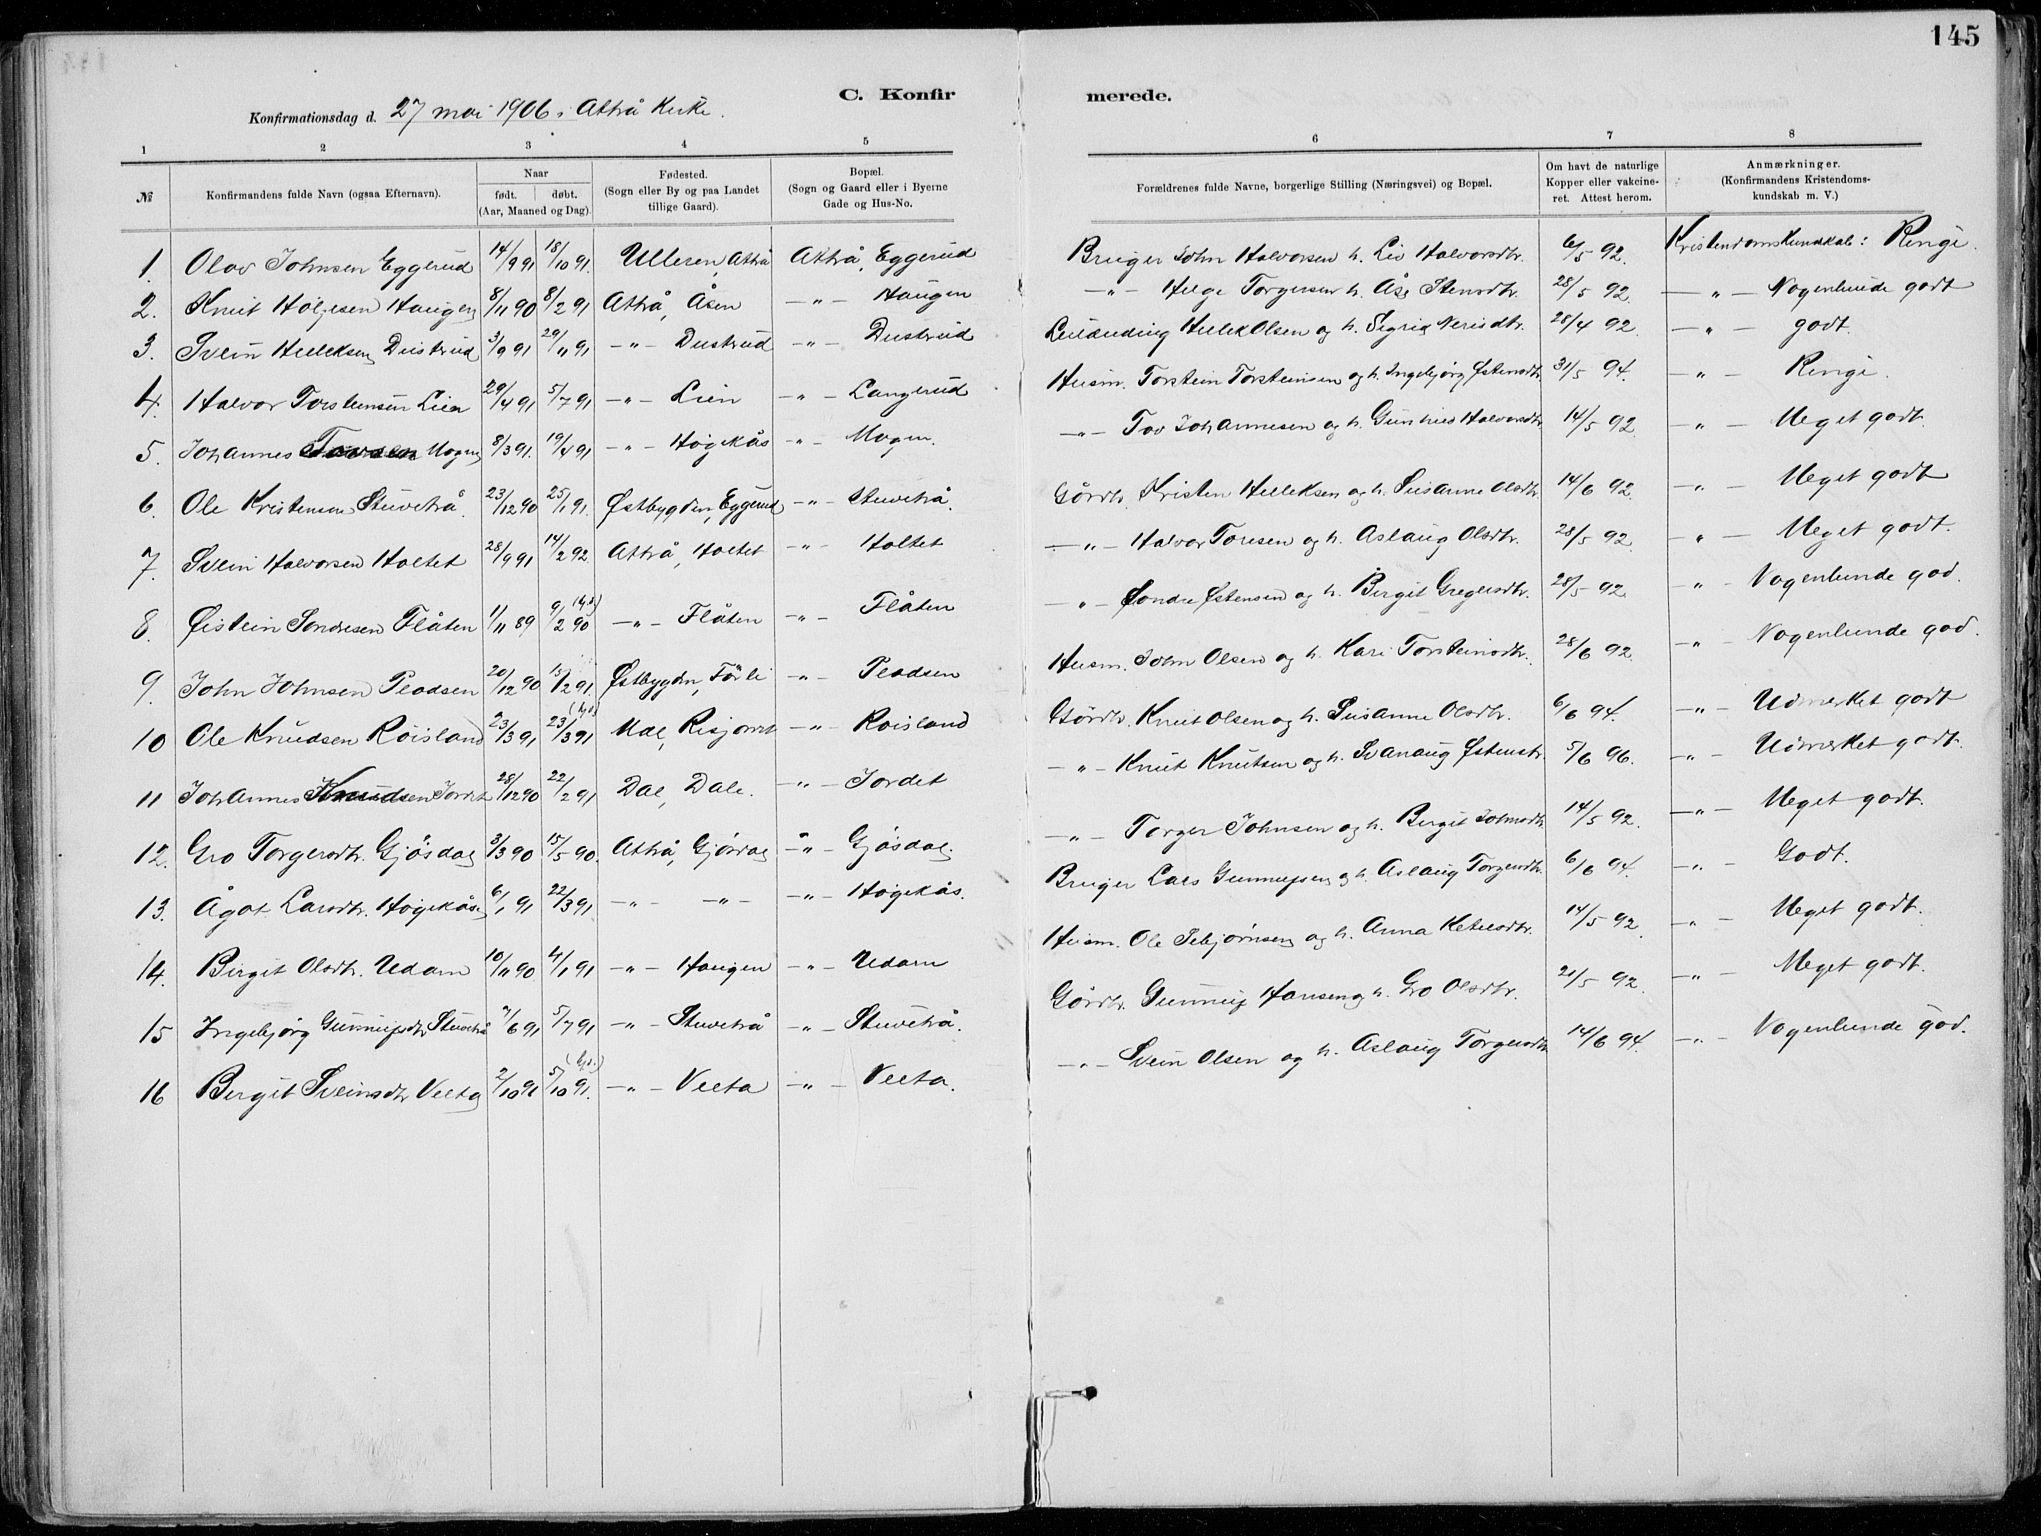 SAKO, Tinn kirkebøker, F/Fa/L0007: Ministerialbok nr. I 7, 1878-1922, s. 145